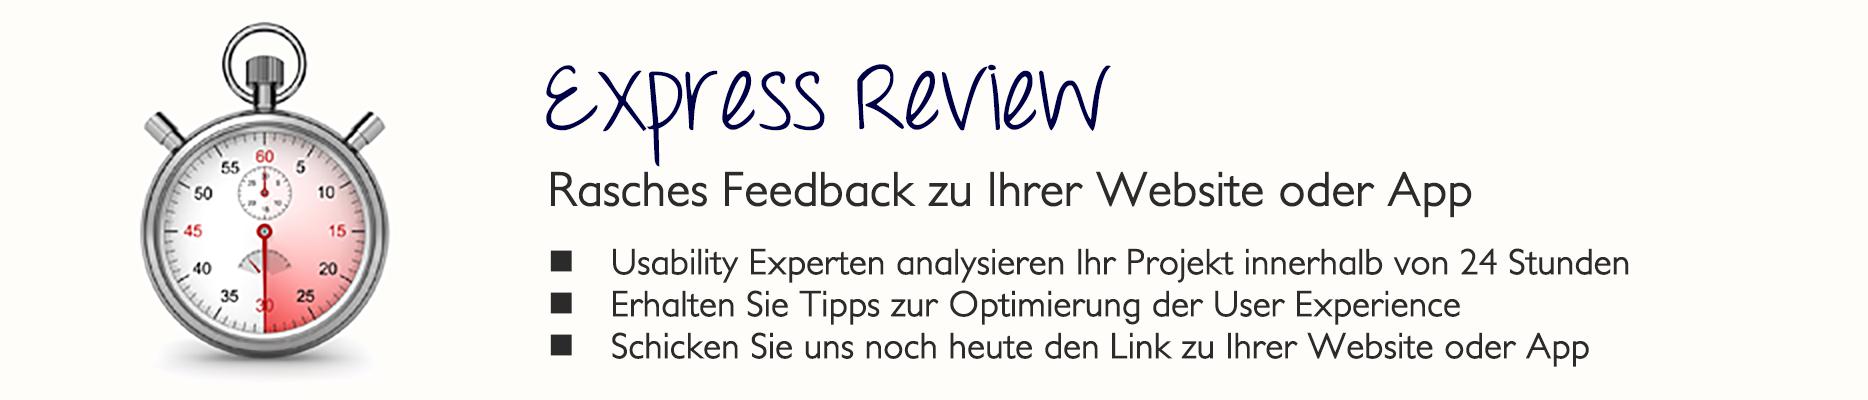 Web Express Review